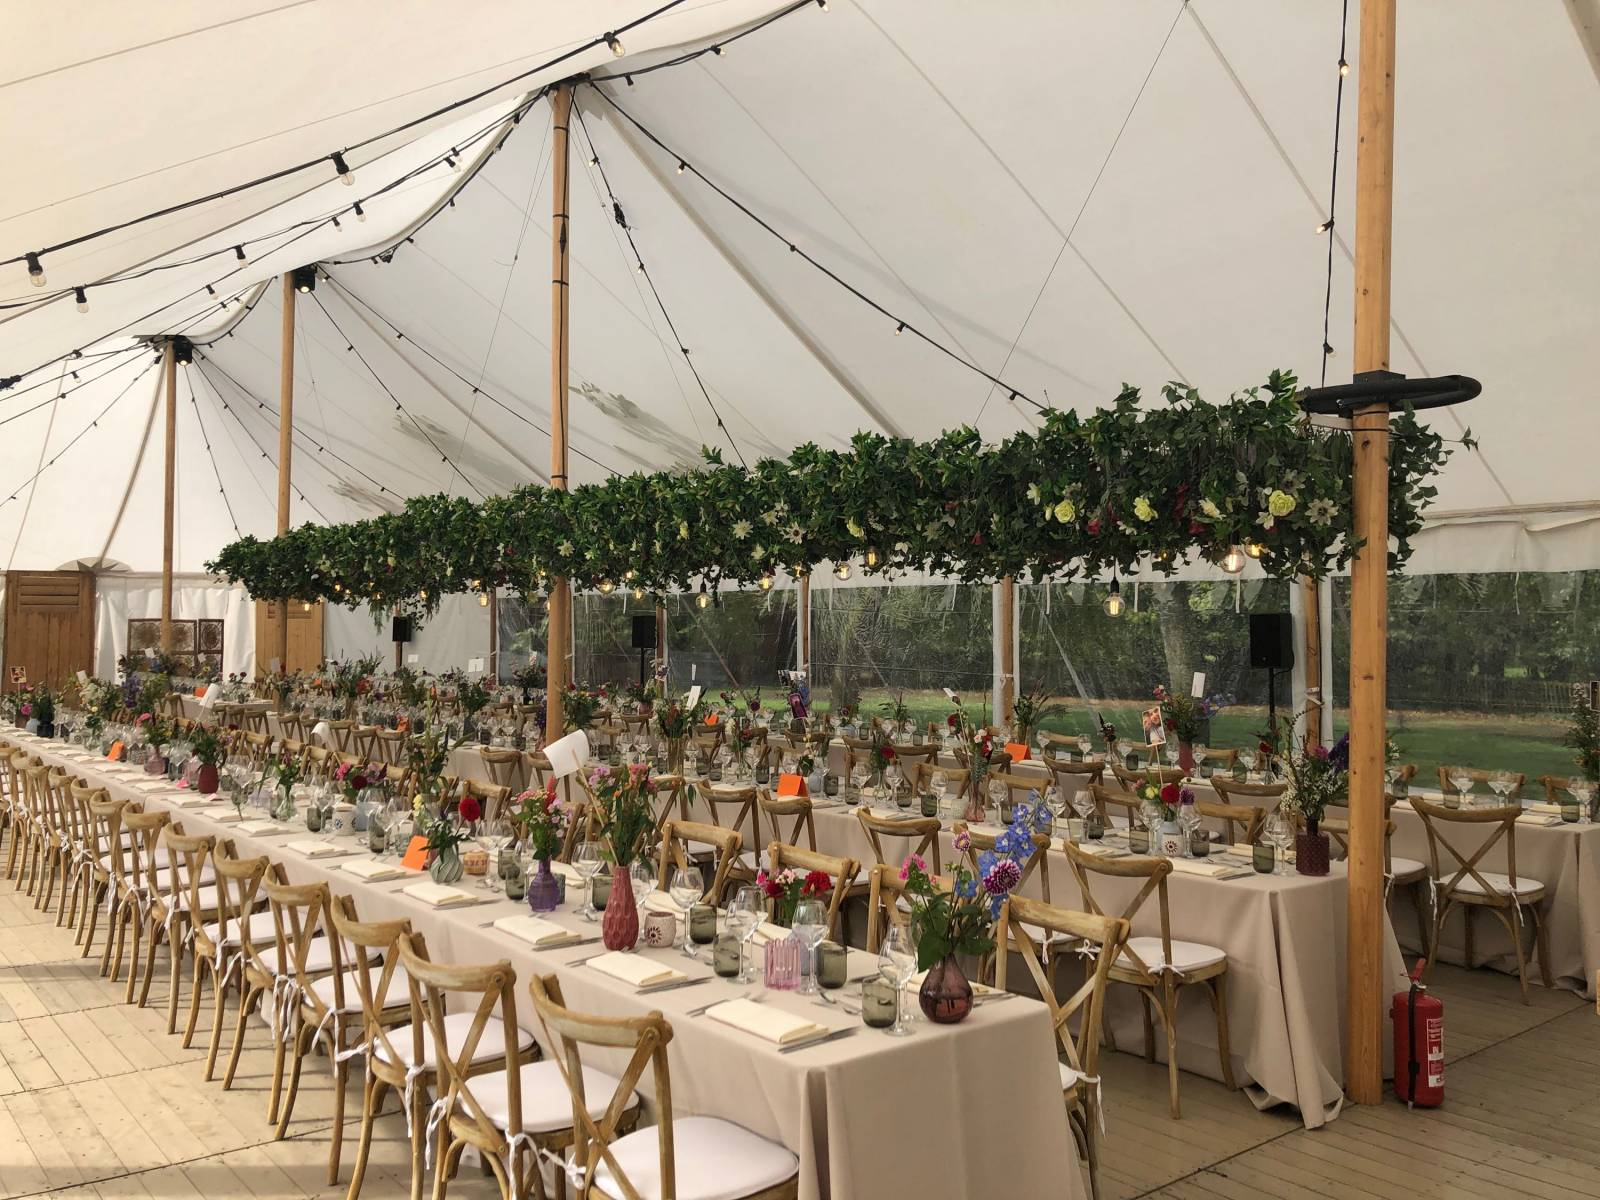 Insieme - Catering - Cateraar - Traiteur - House of Events - House of Weddings - 12